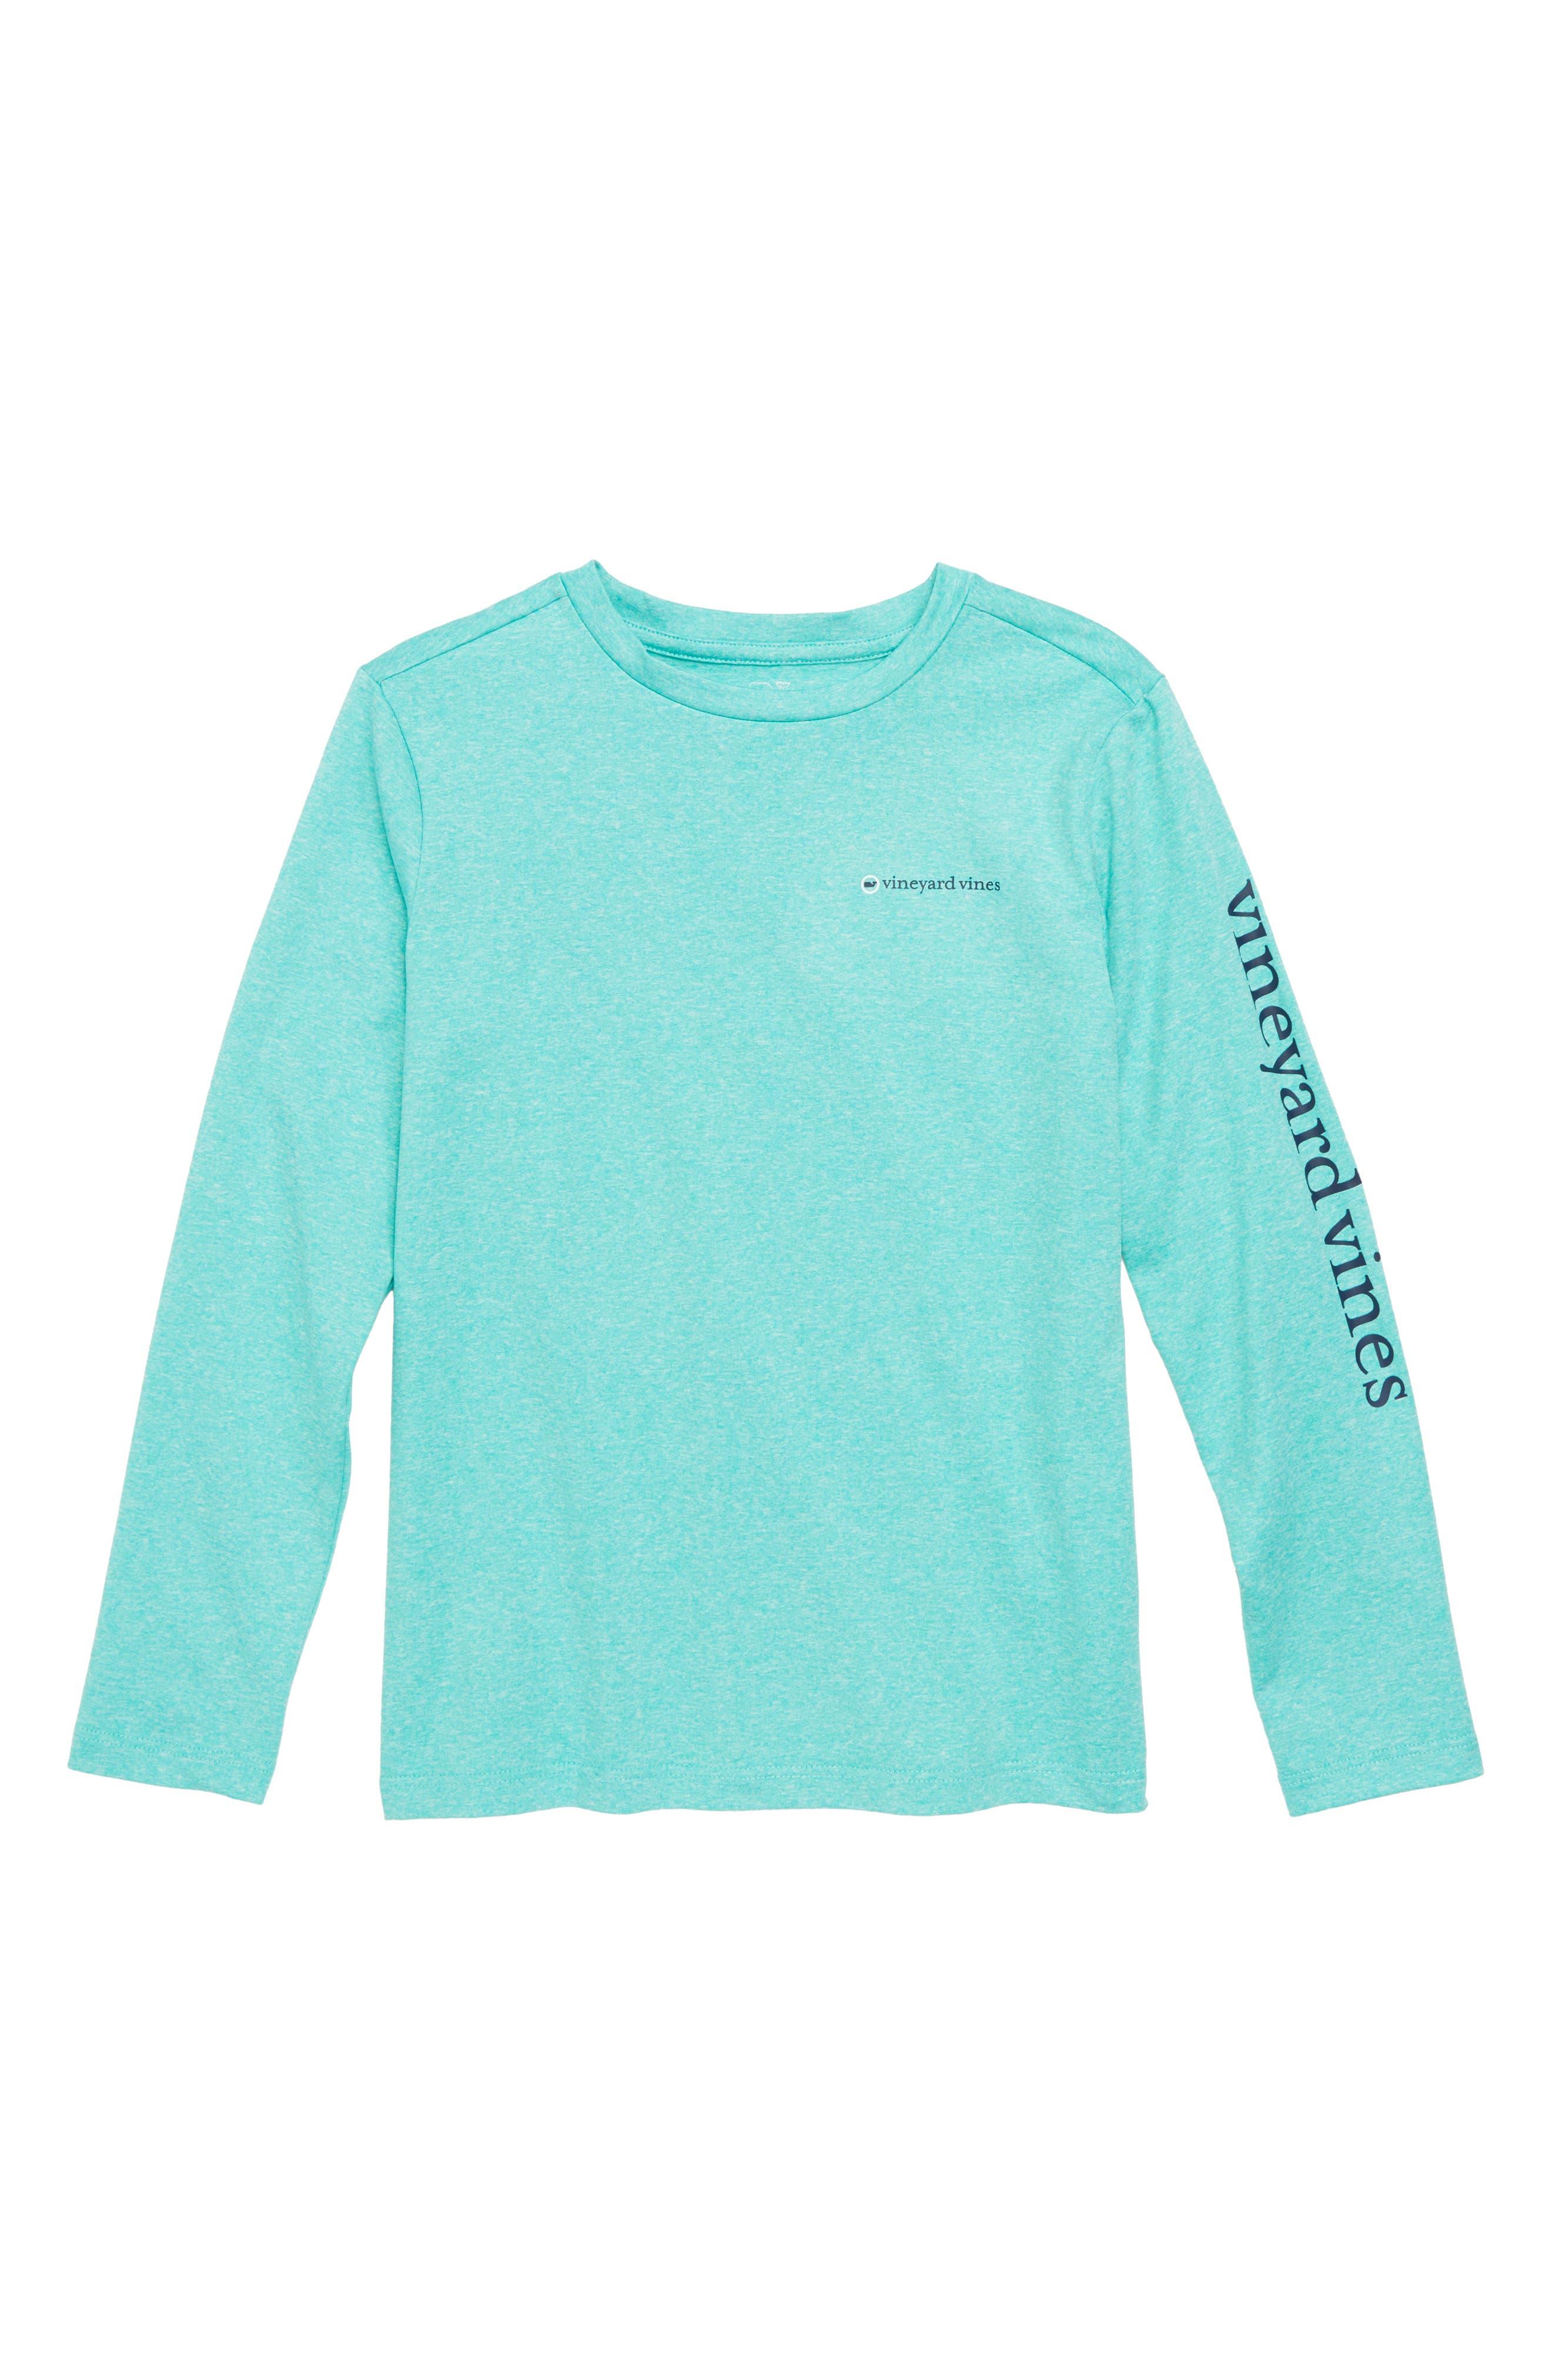 Performance Shirt,                             Main thumbnail 1, color,                             440